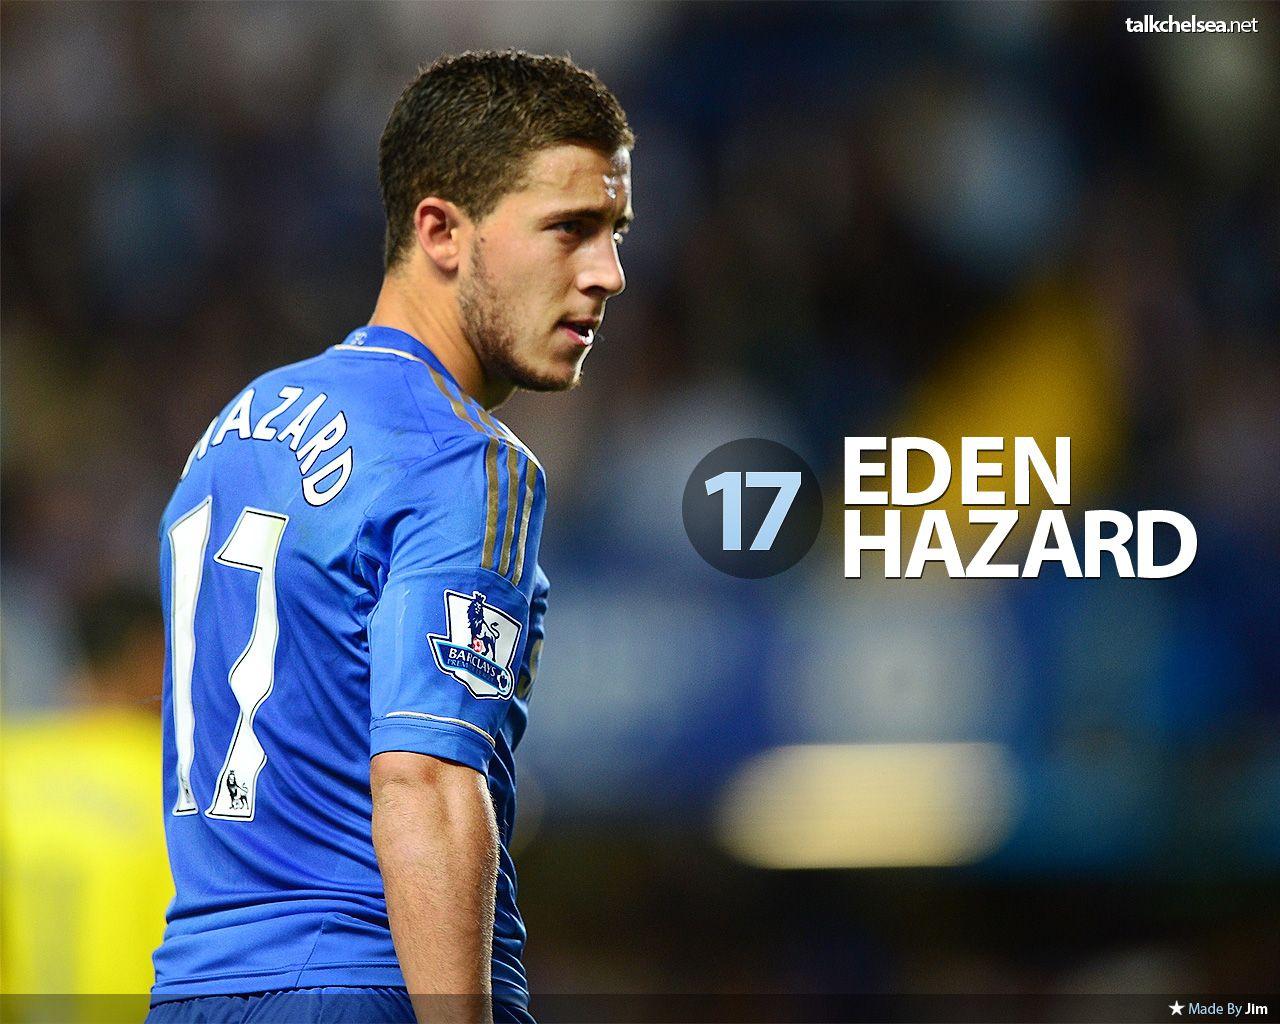 Image for Eden Hazard Chelsea HD Wallpaper Soccer